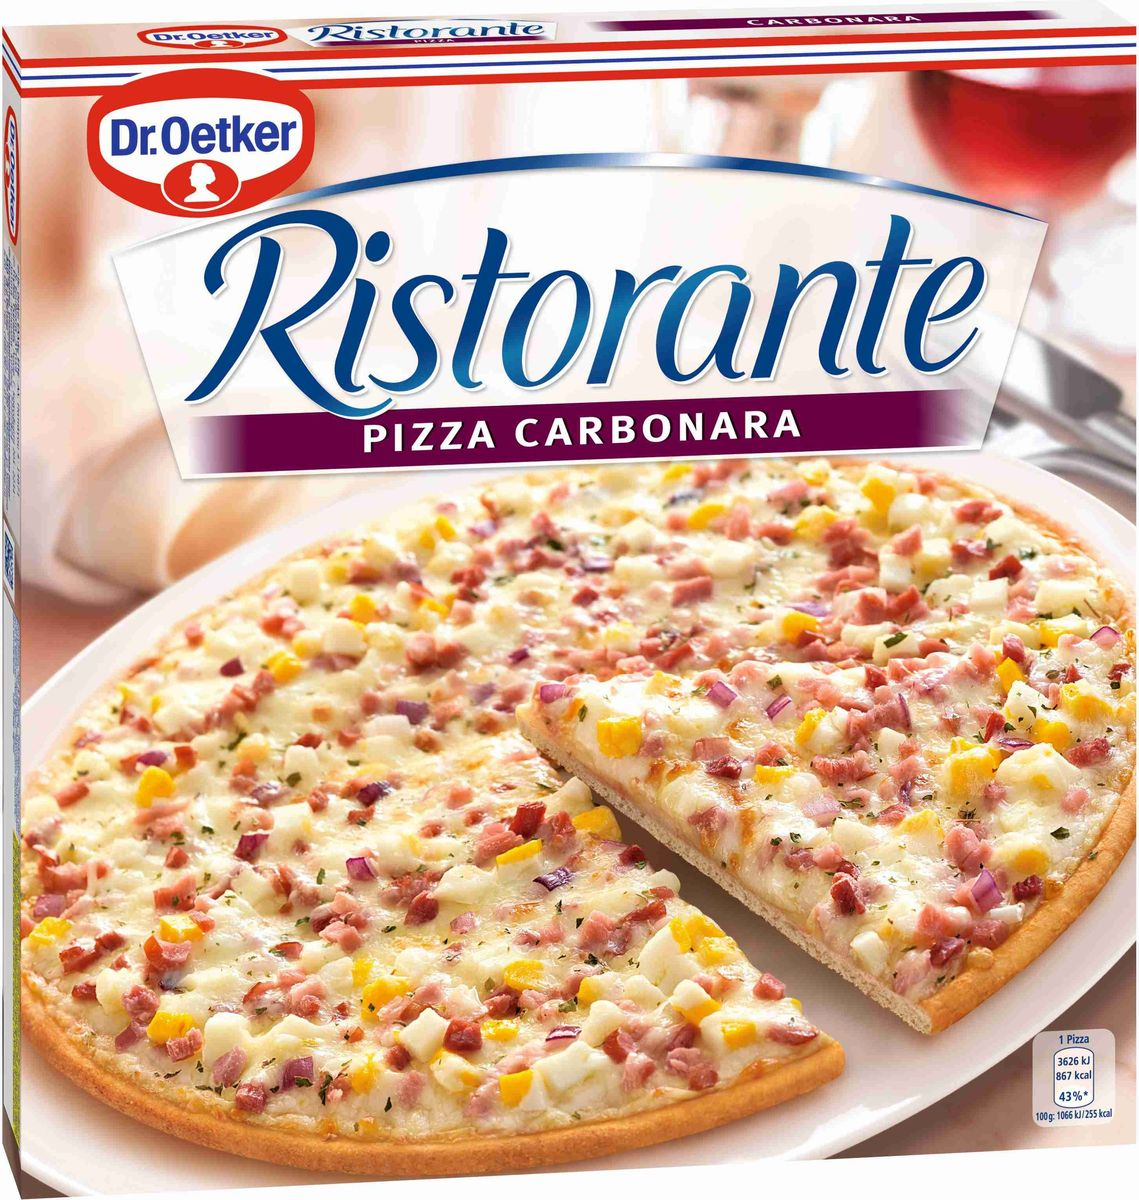 Dr.Oetker Пицца Ristorante Карбонара, 340 г hasbro пицца